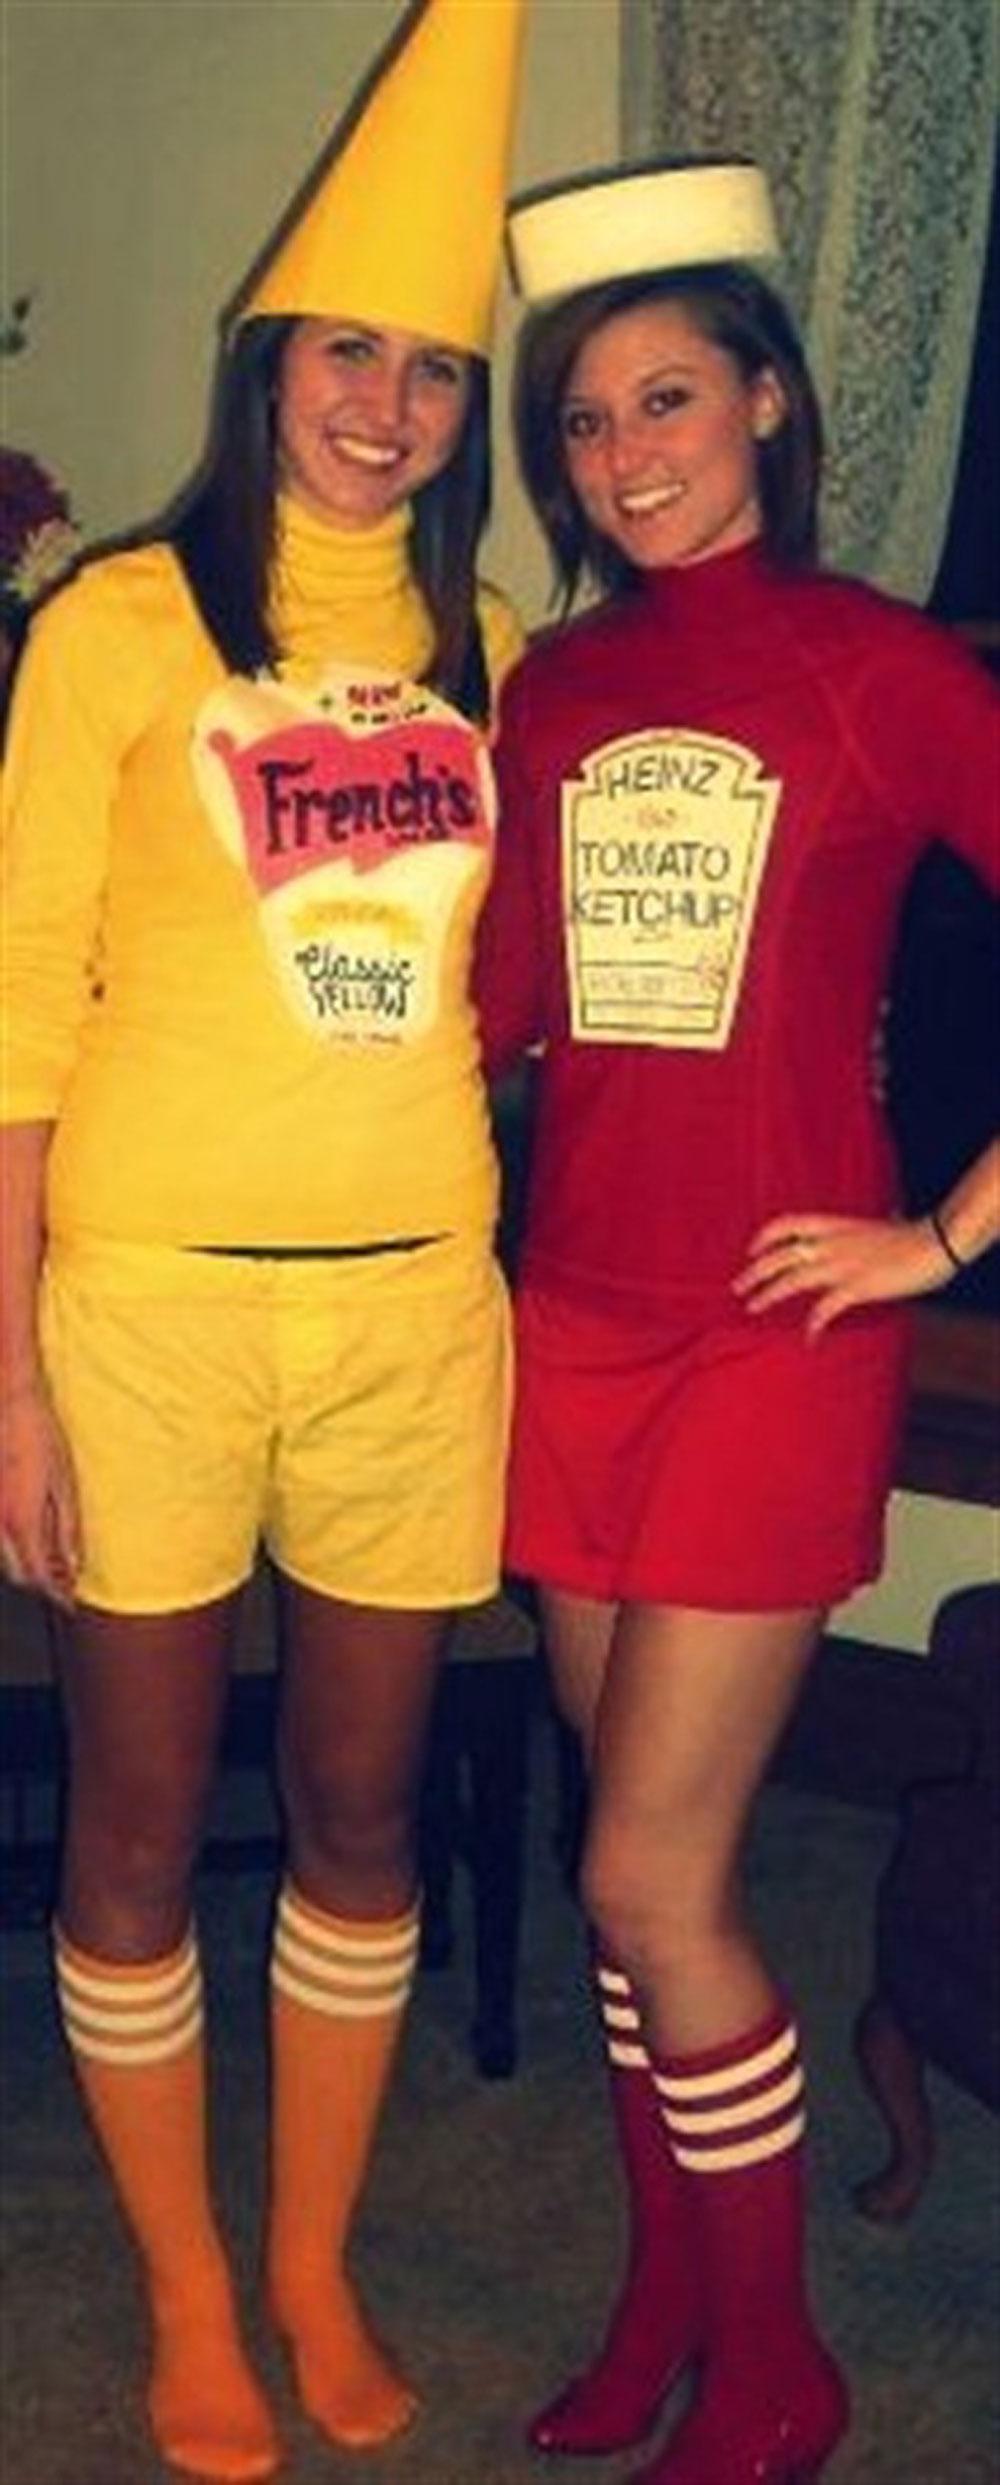 Best Friend Halloween Costume Ideas costume works Frozen Costume Diy Anna And Elsa With My Best Friend For Our High Schools Spirit Week Character Day Spirit Week Pinterest Frozen Costume